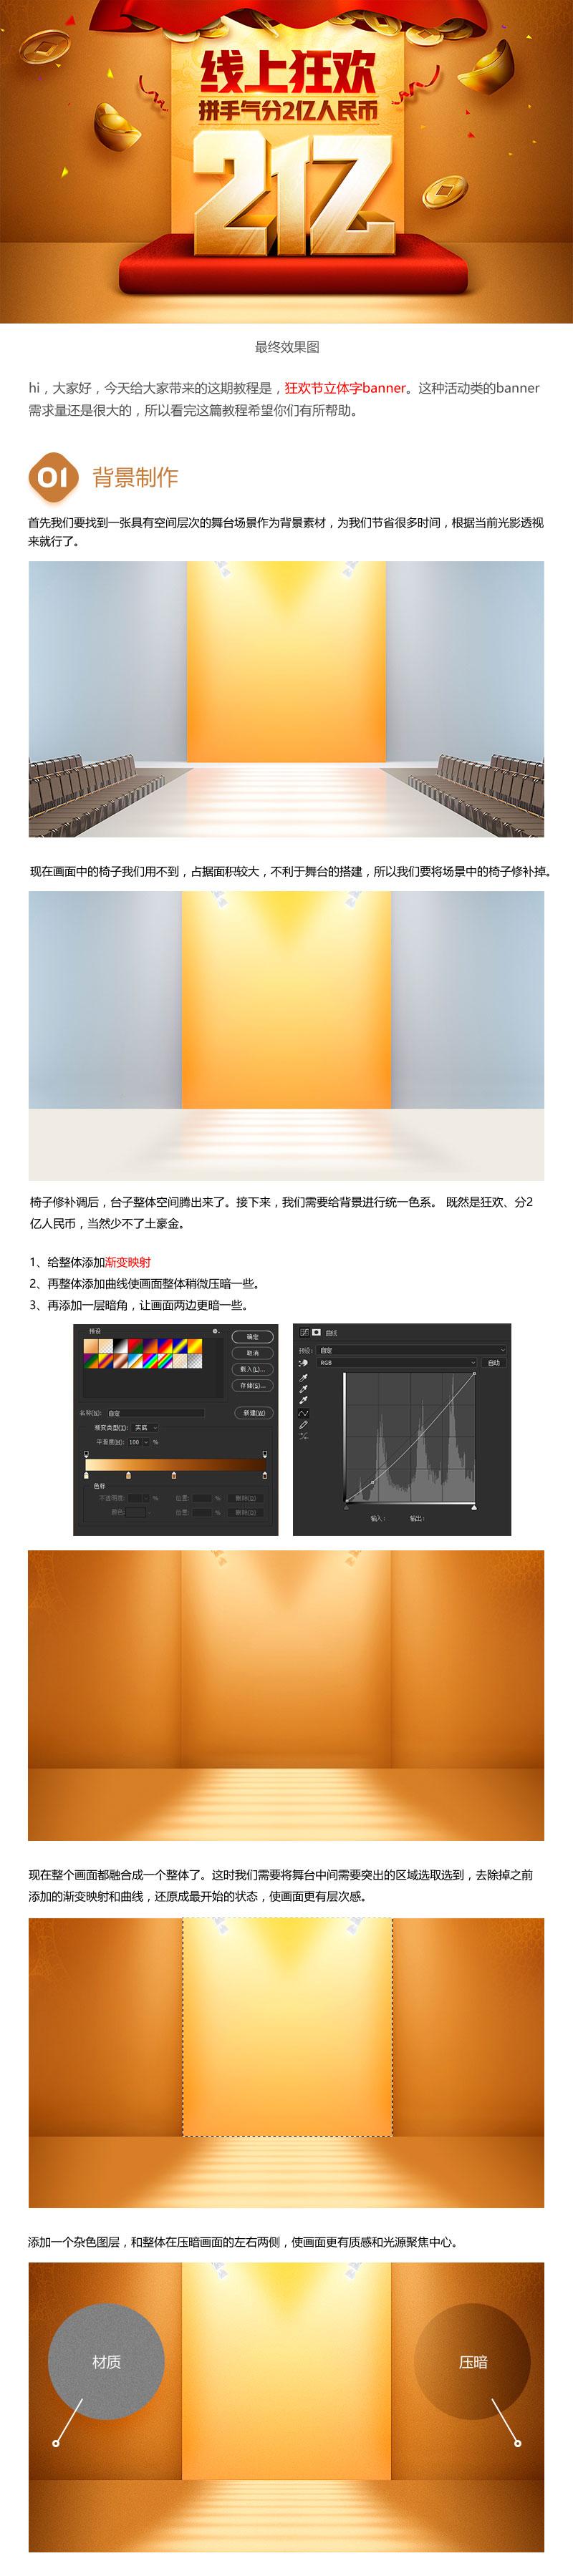 Photoshop设计双12立体字为主题的海报,PS教程,思缘教程网